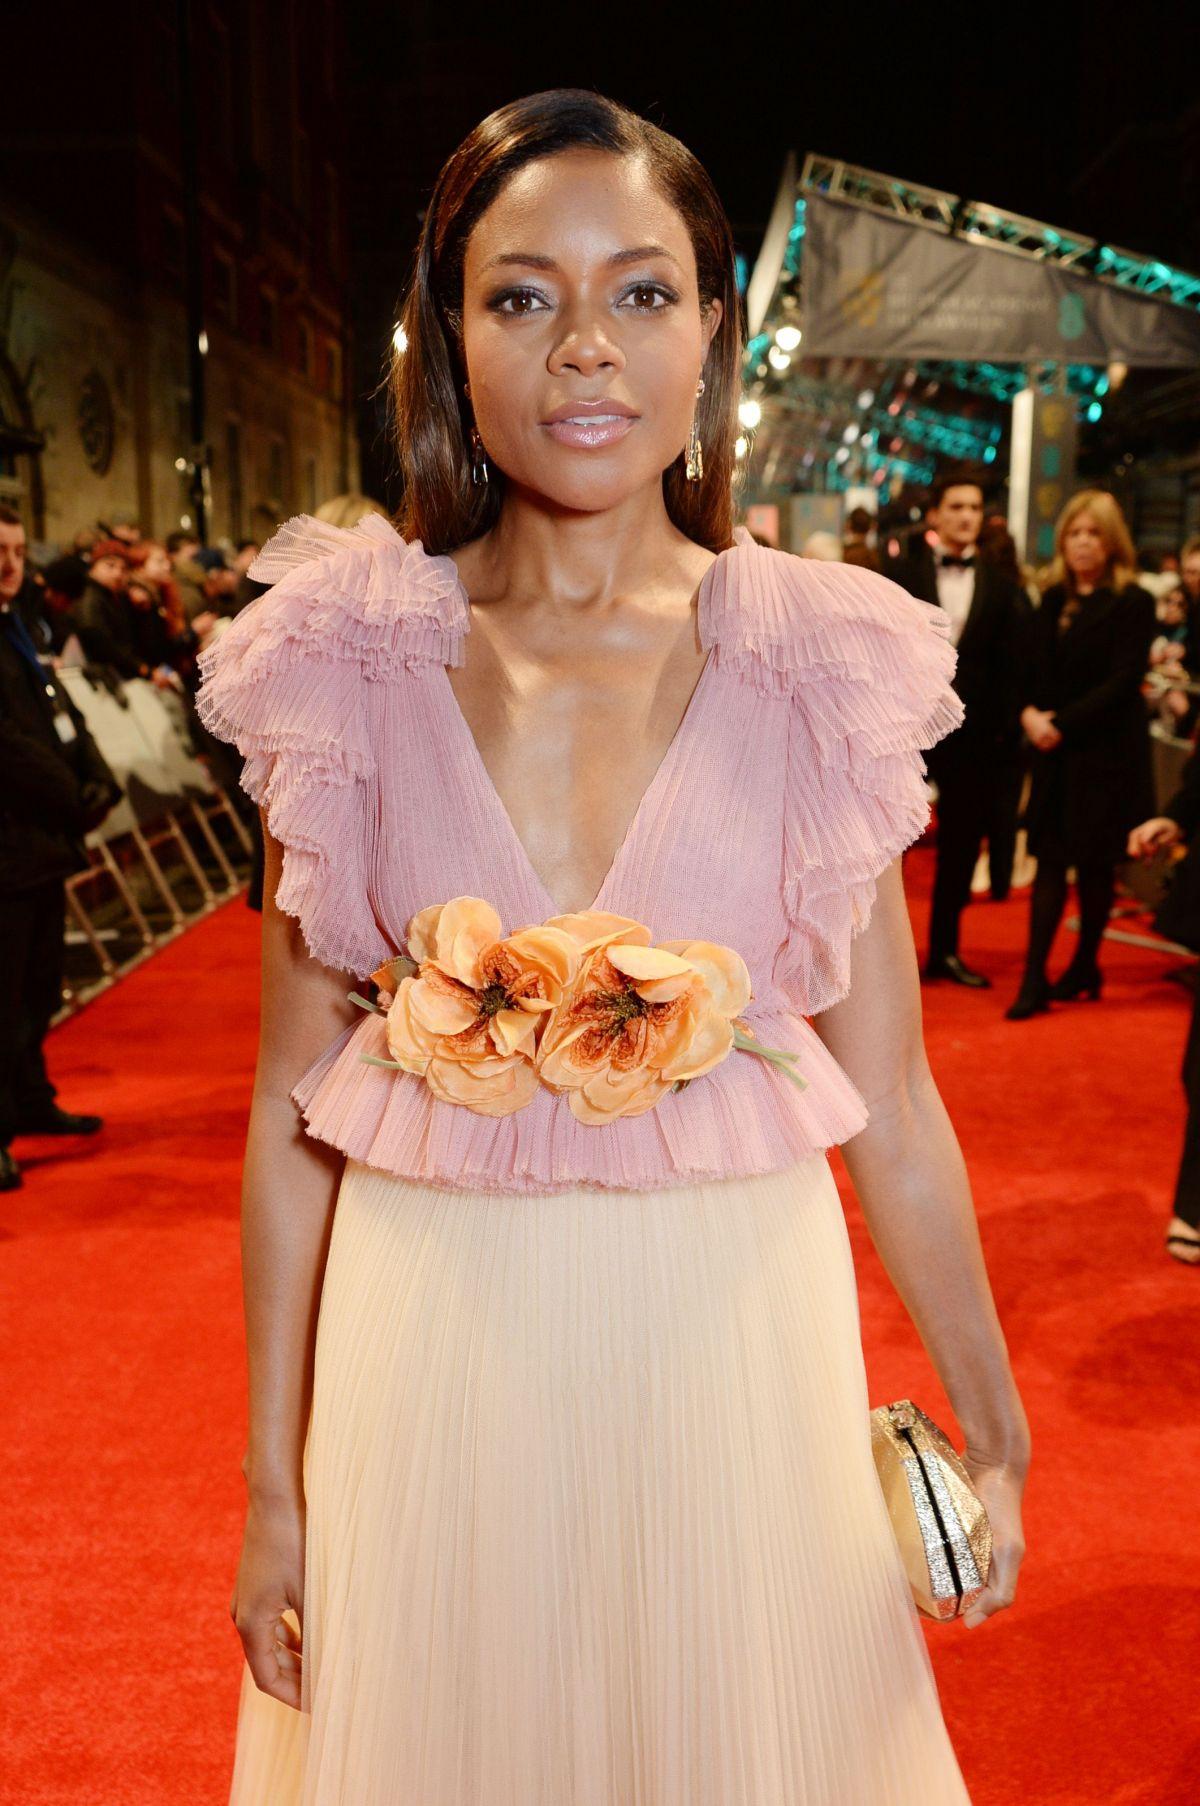 NAOMIE HARRIS at Bafta 2017 Awards in London 02/12/2017